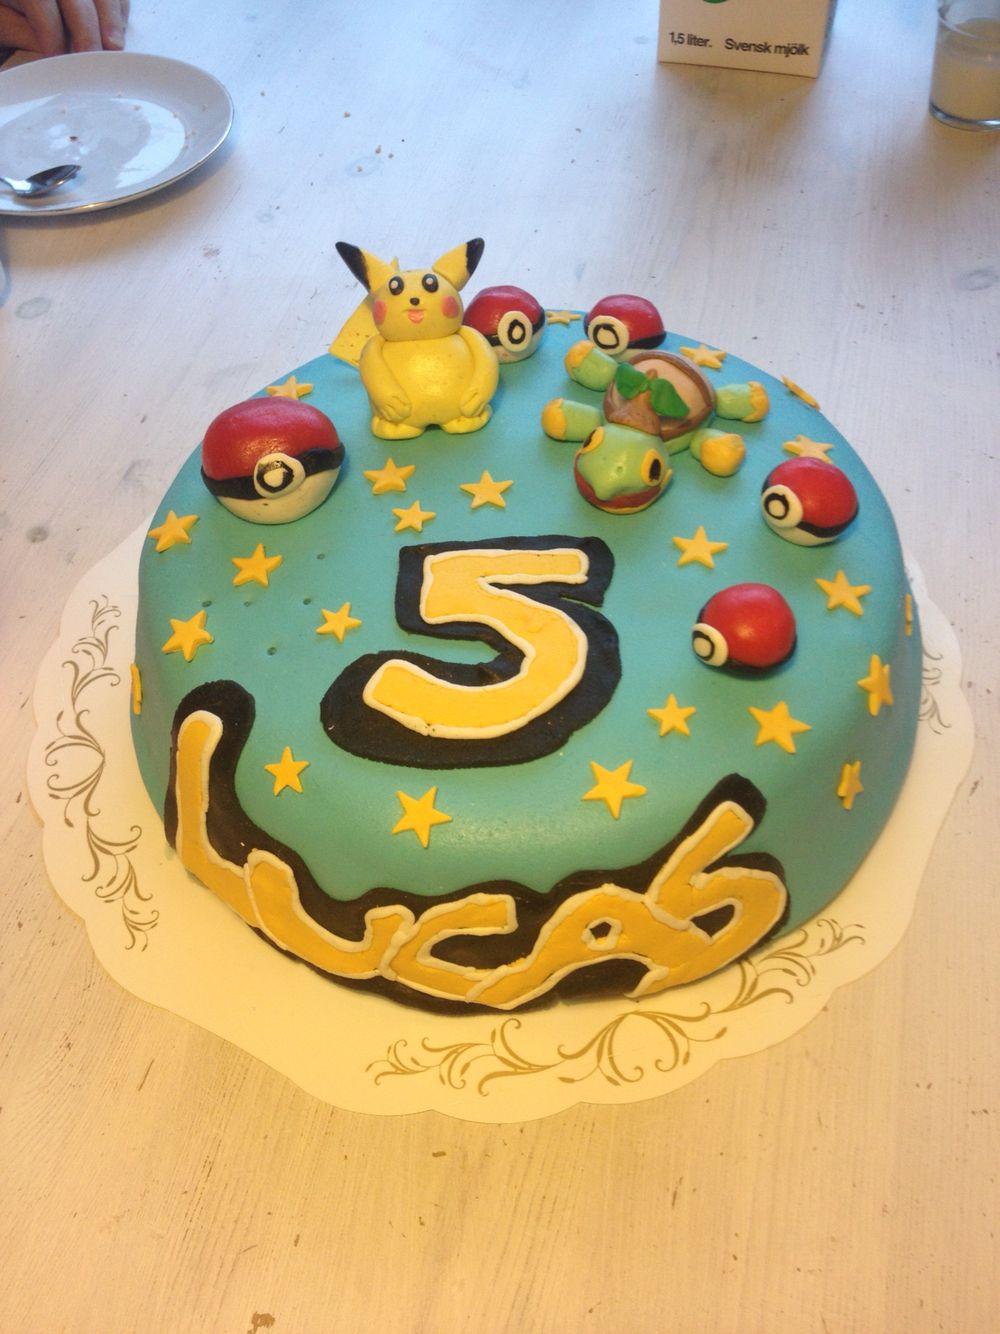 5 års tårta